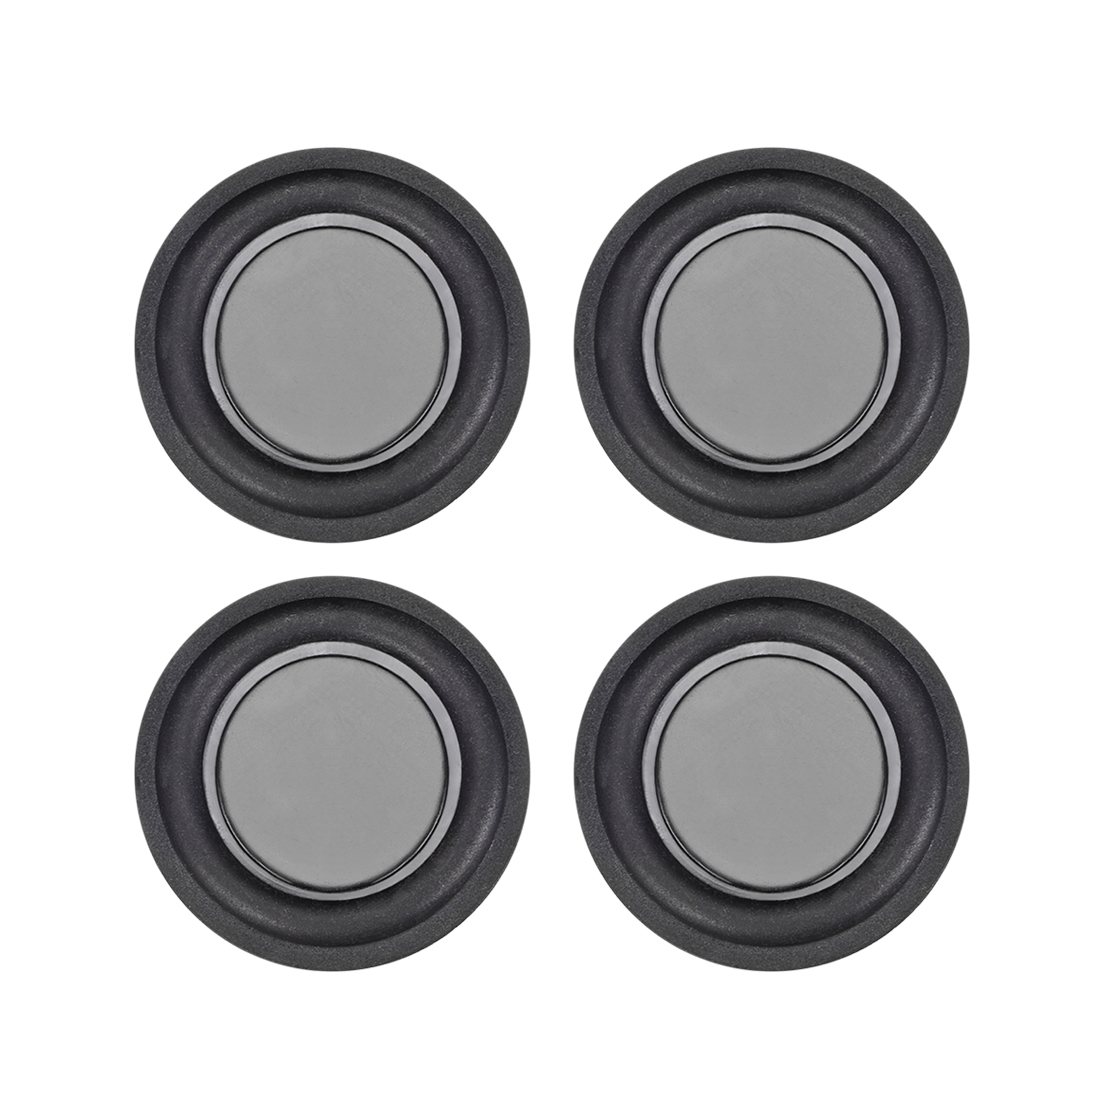 "4Pcs 1.5"" 40mm Bass Speaker Passive Radiator Rubber Vibration Plate DIY Repair"